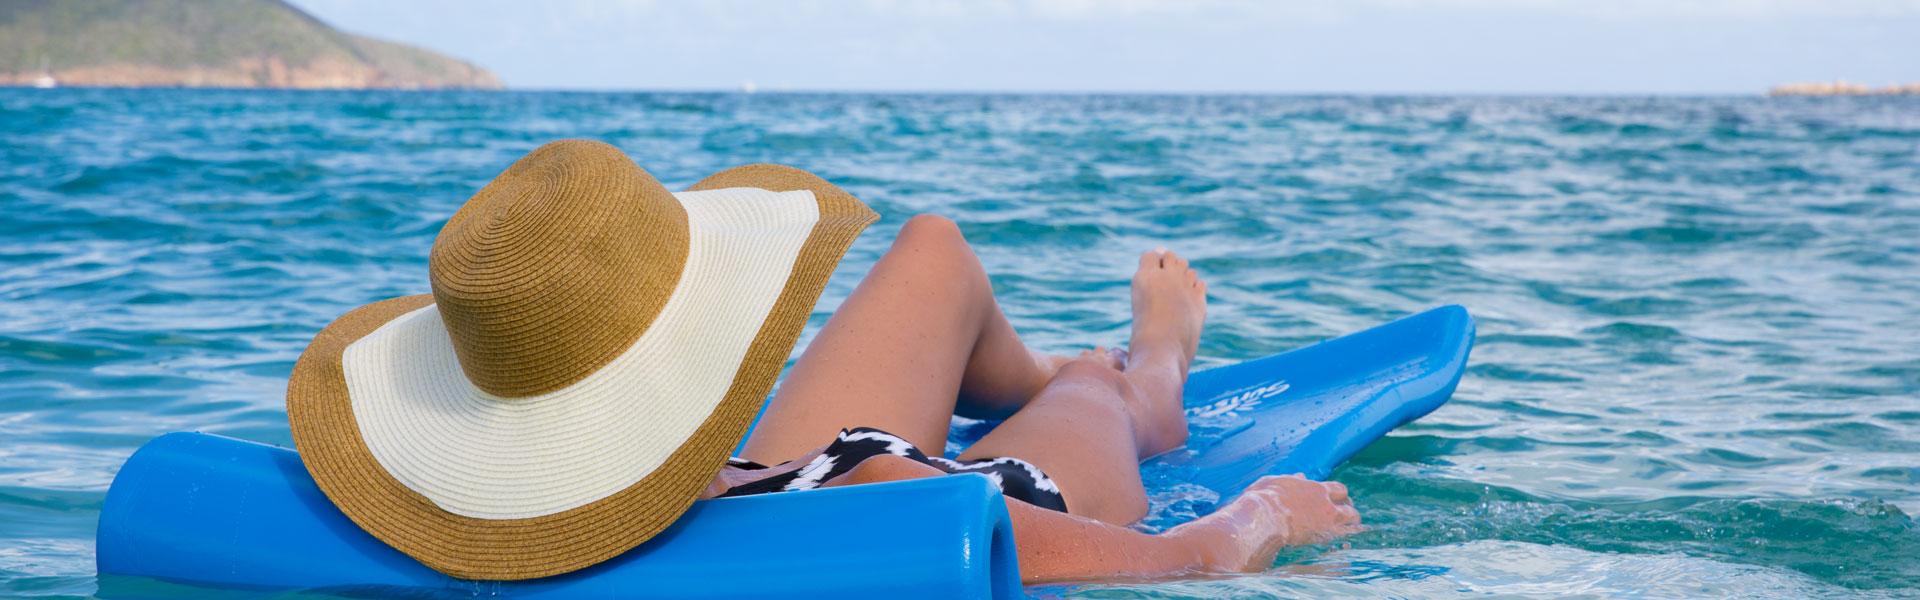 Guest enjoying Caribbean cruise